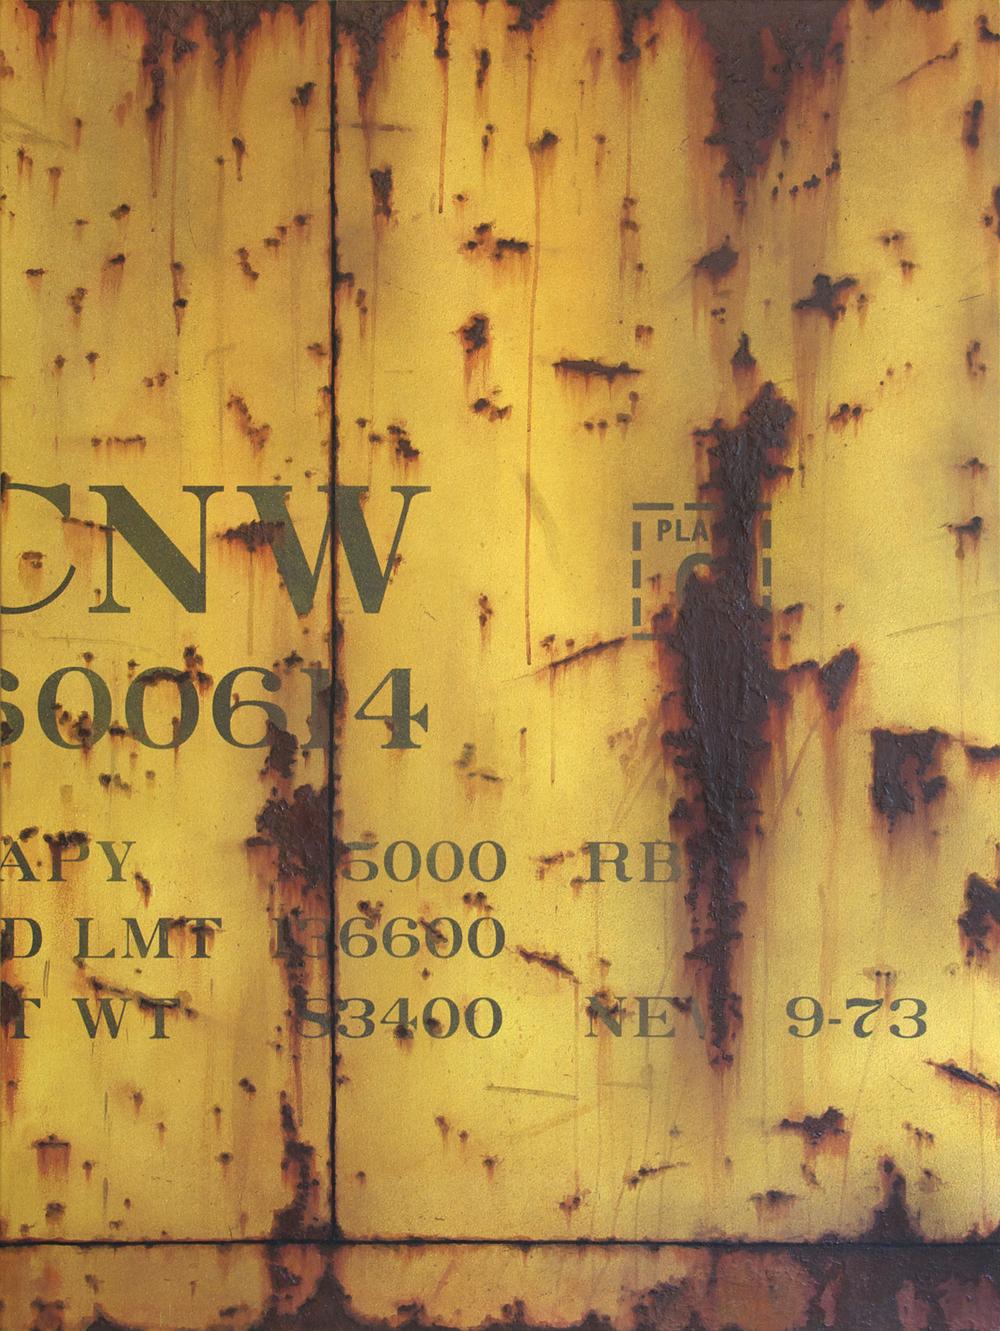 Blank Canvas #31 – CNW, Freight Train Painting, Boxcar Painting, Railroad Art, Tim Conlon Art